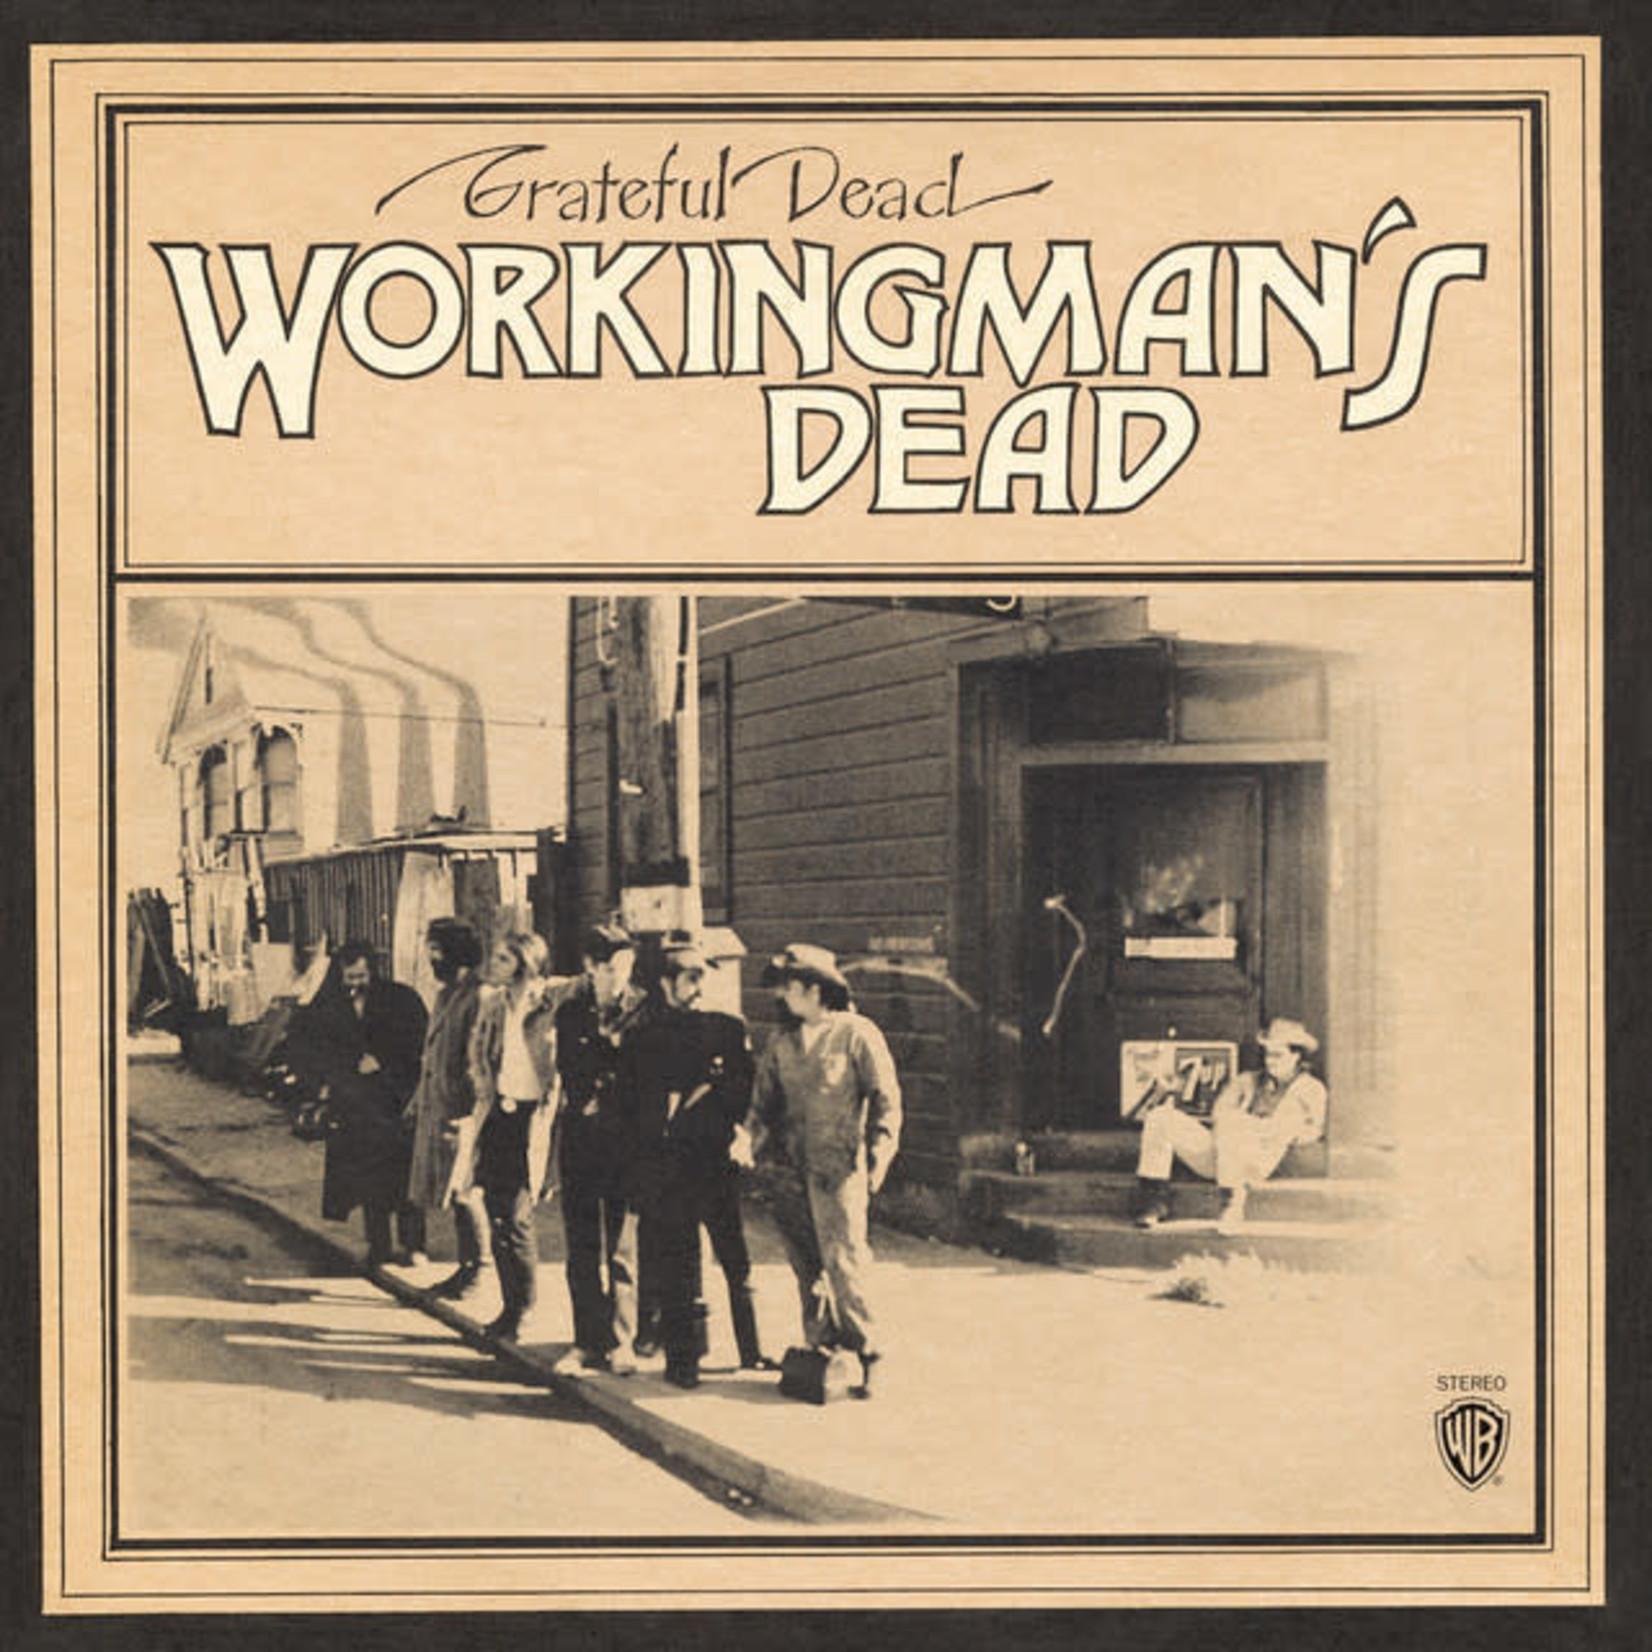 Vinyl The Grateful Dead - Workingman's Dead (50th Anniversary) - Picture Disc